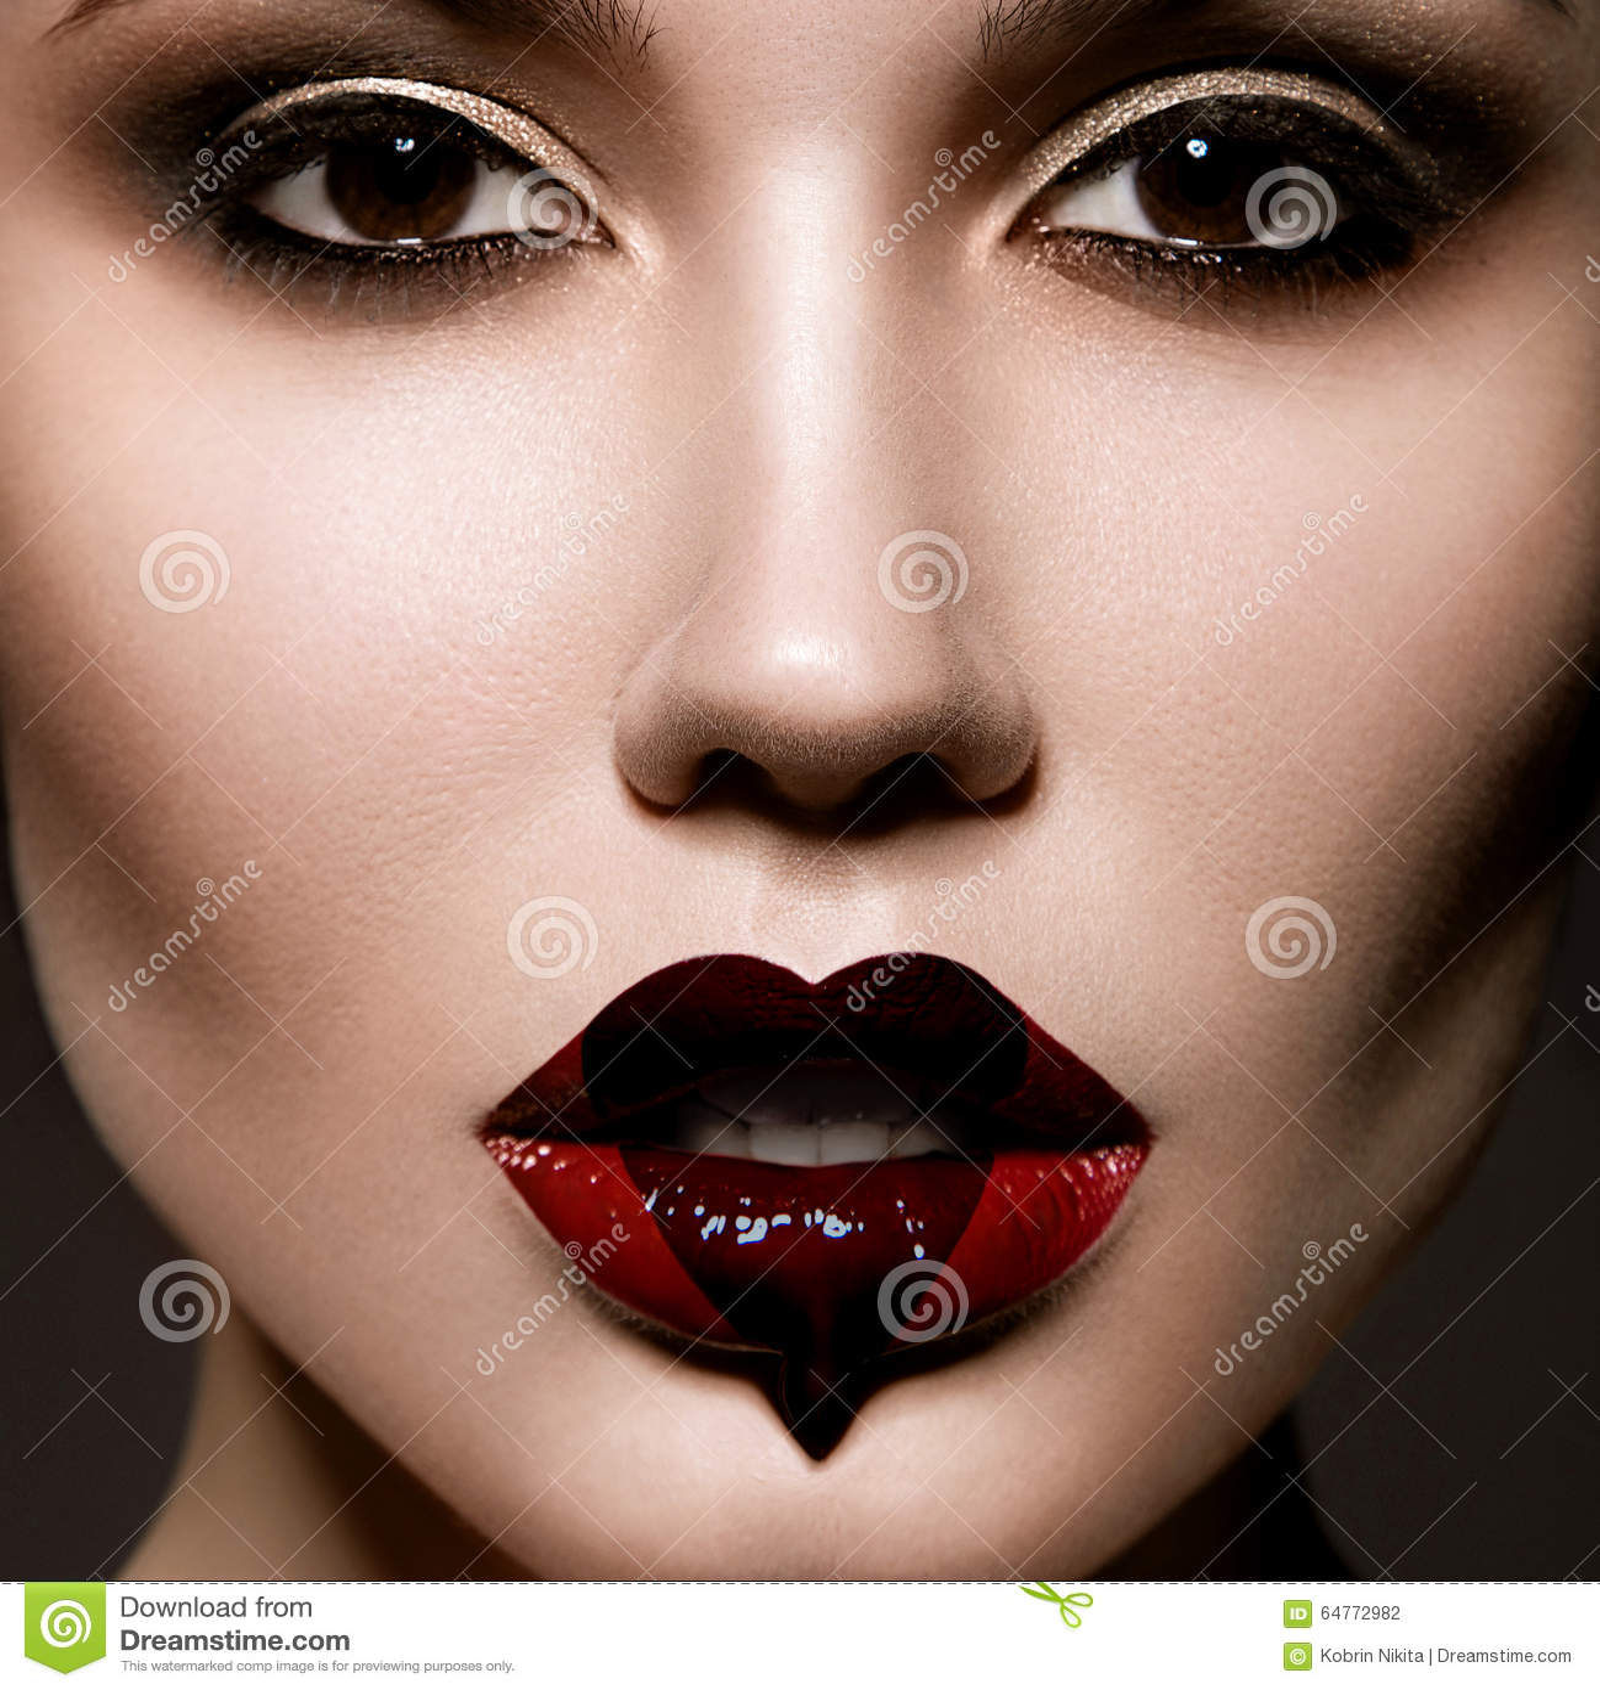 Kreatives Porträt des schönen jungen Mädchens mit a